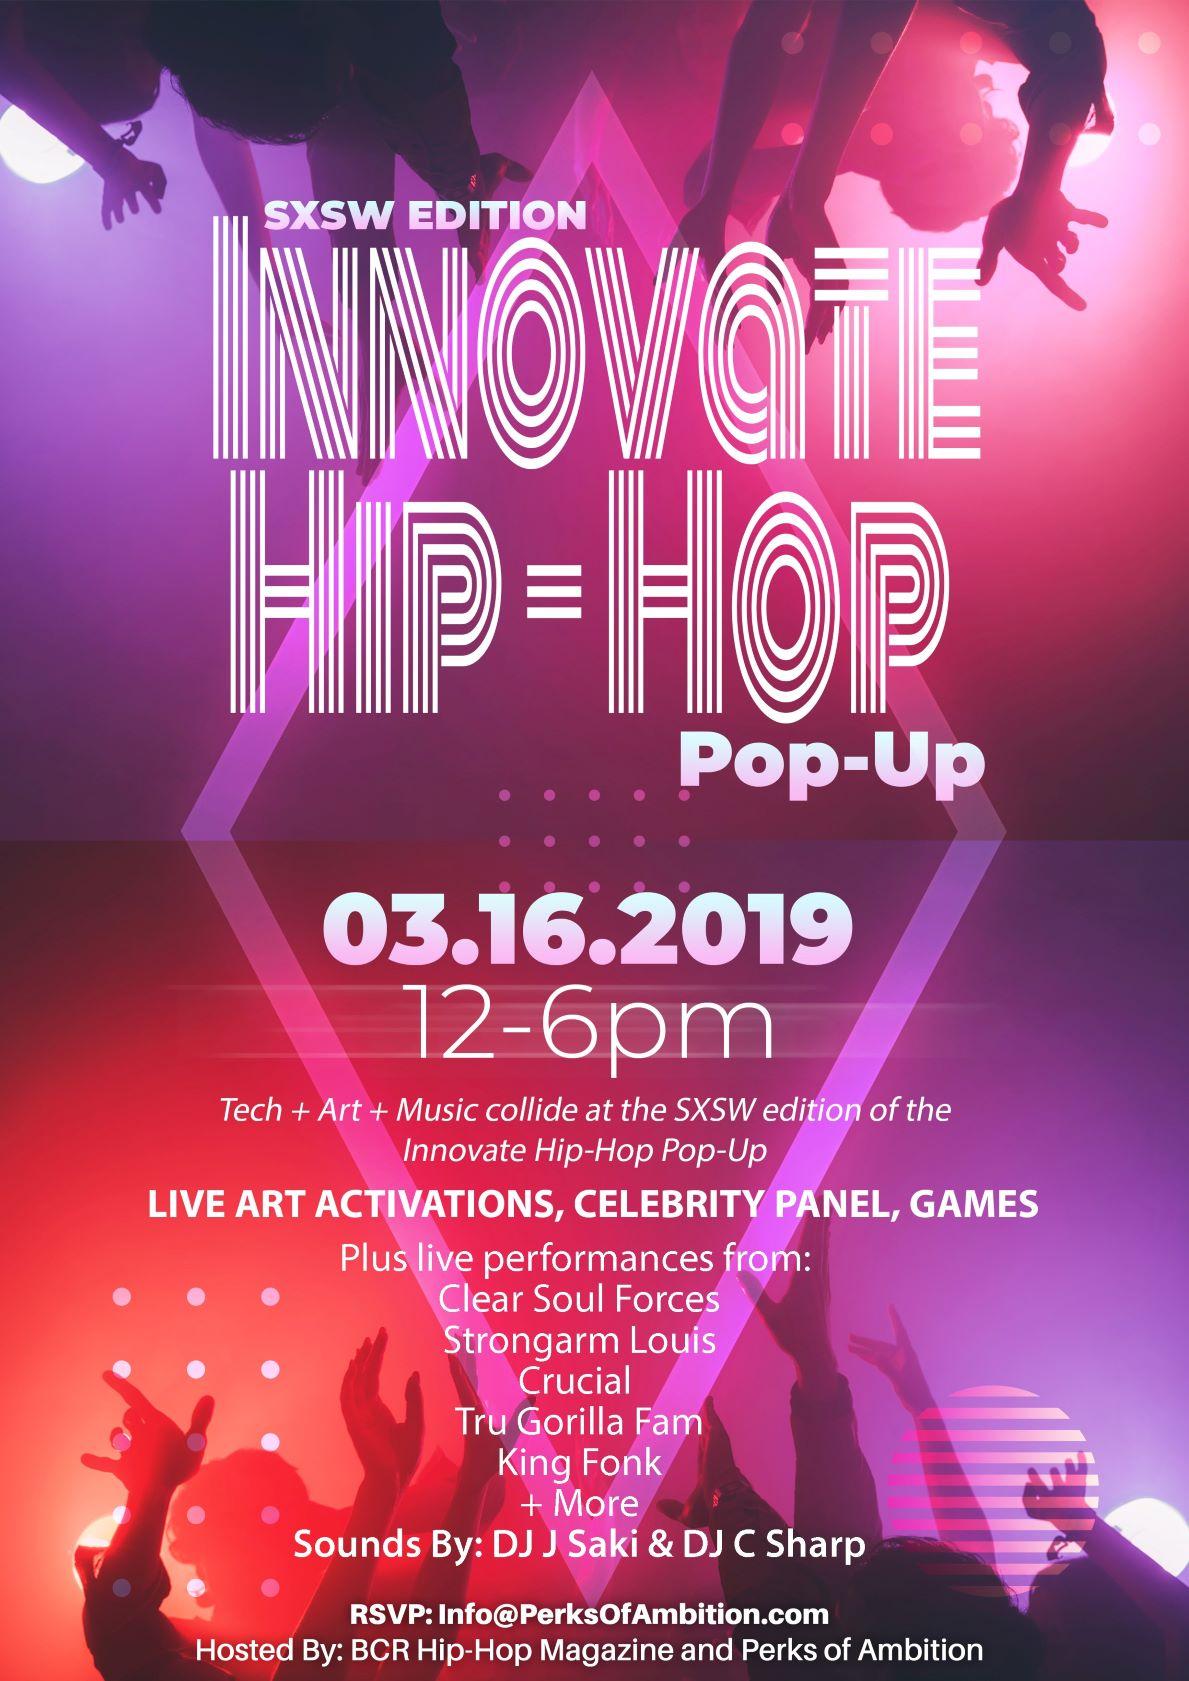 SXSW Innovate Hip-Hop